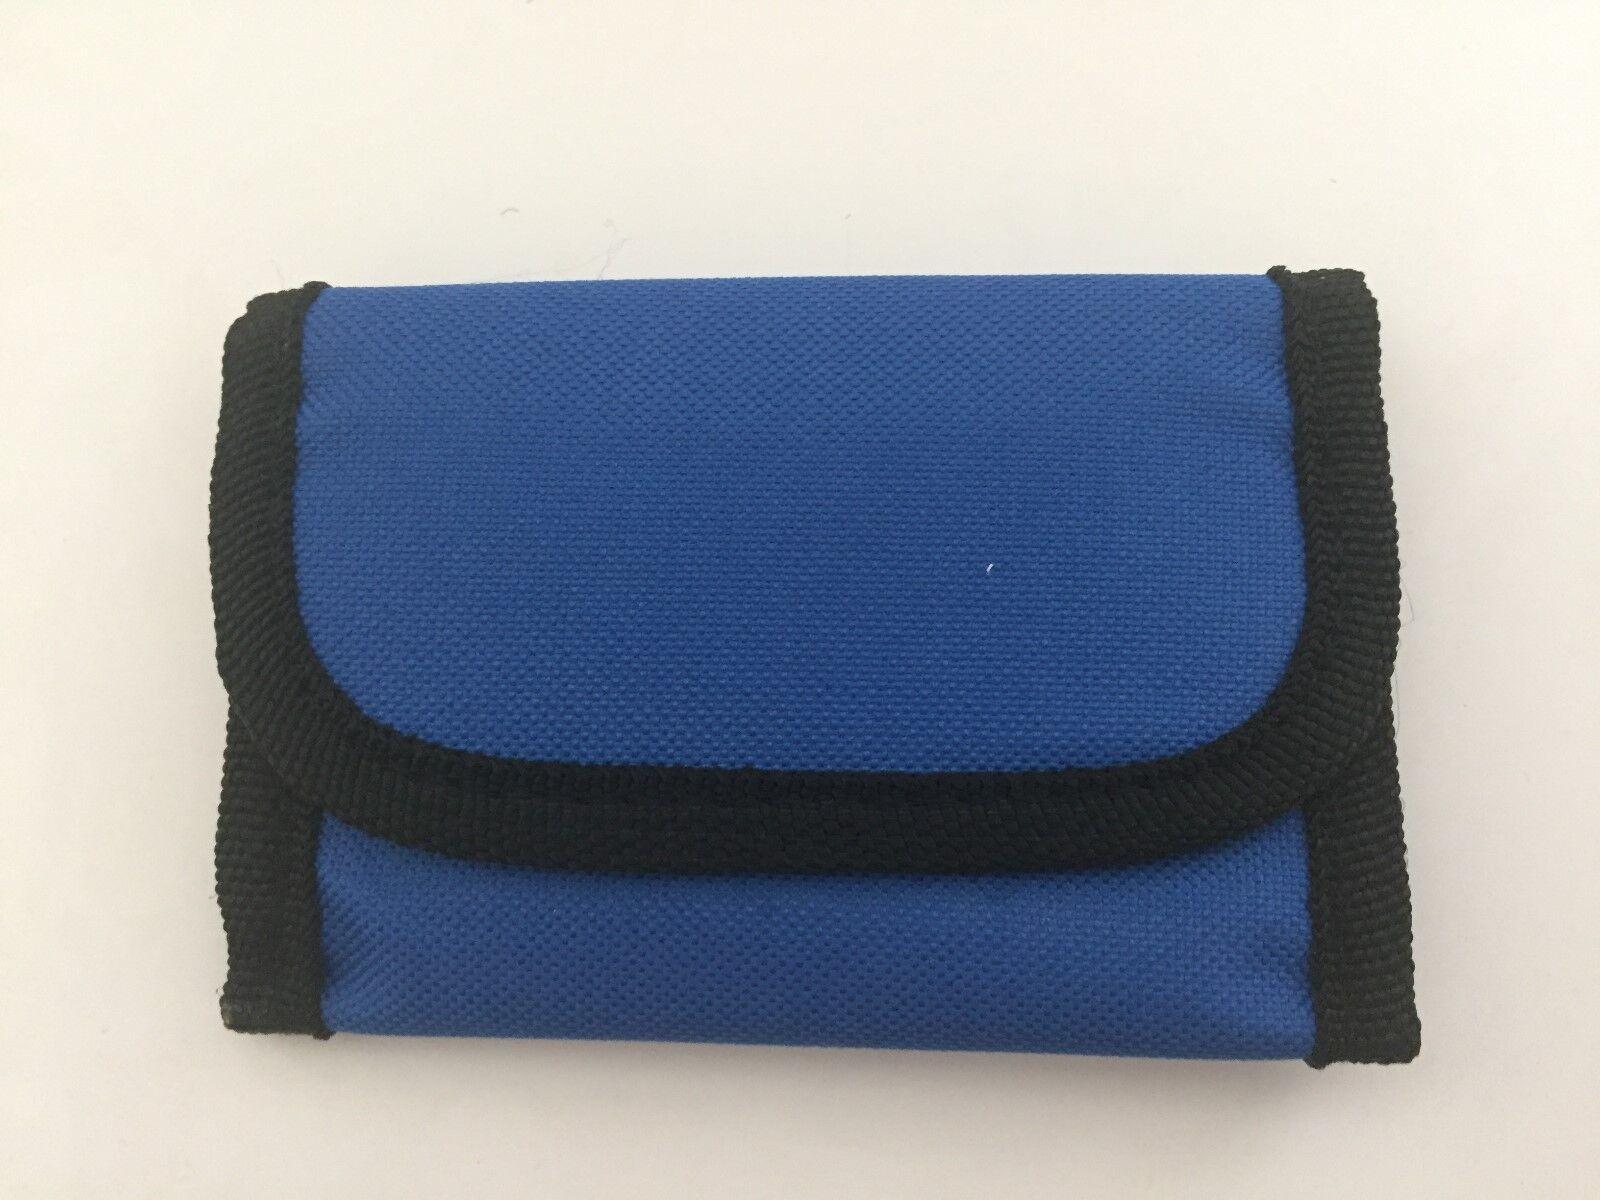 2-Soft Sided Unisex Wallet with Belt Strap-Royal Blue